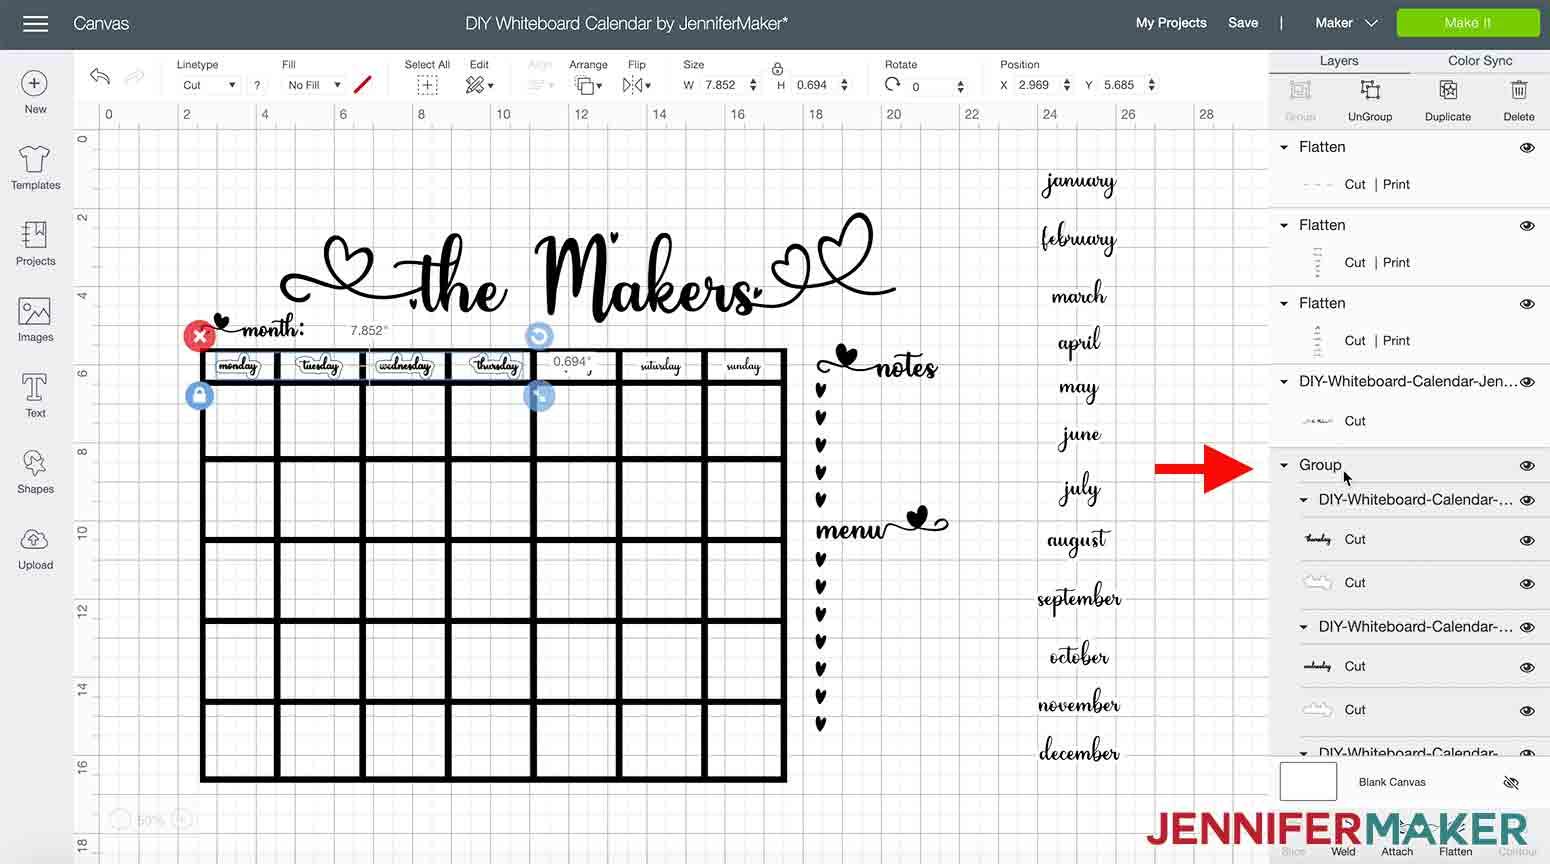 DIY-Whiteboard-Calendar-JenniferMaker-select-group-four